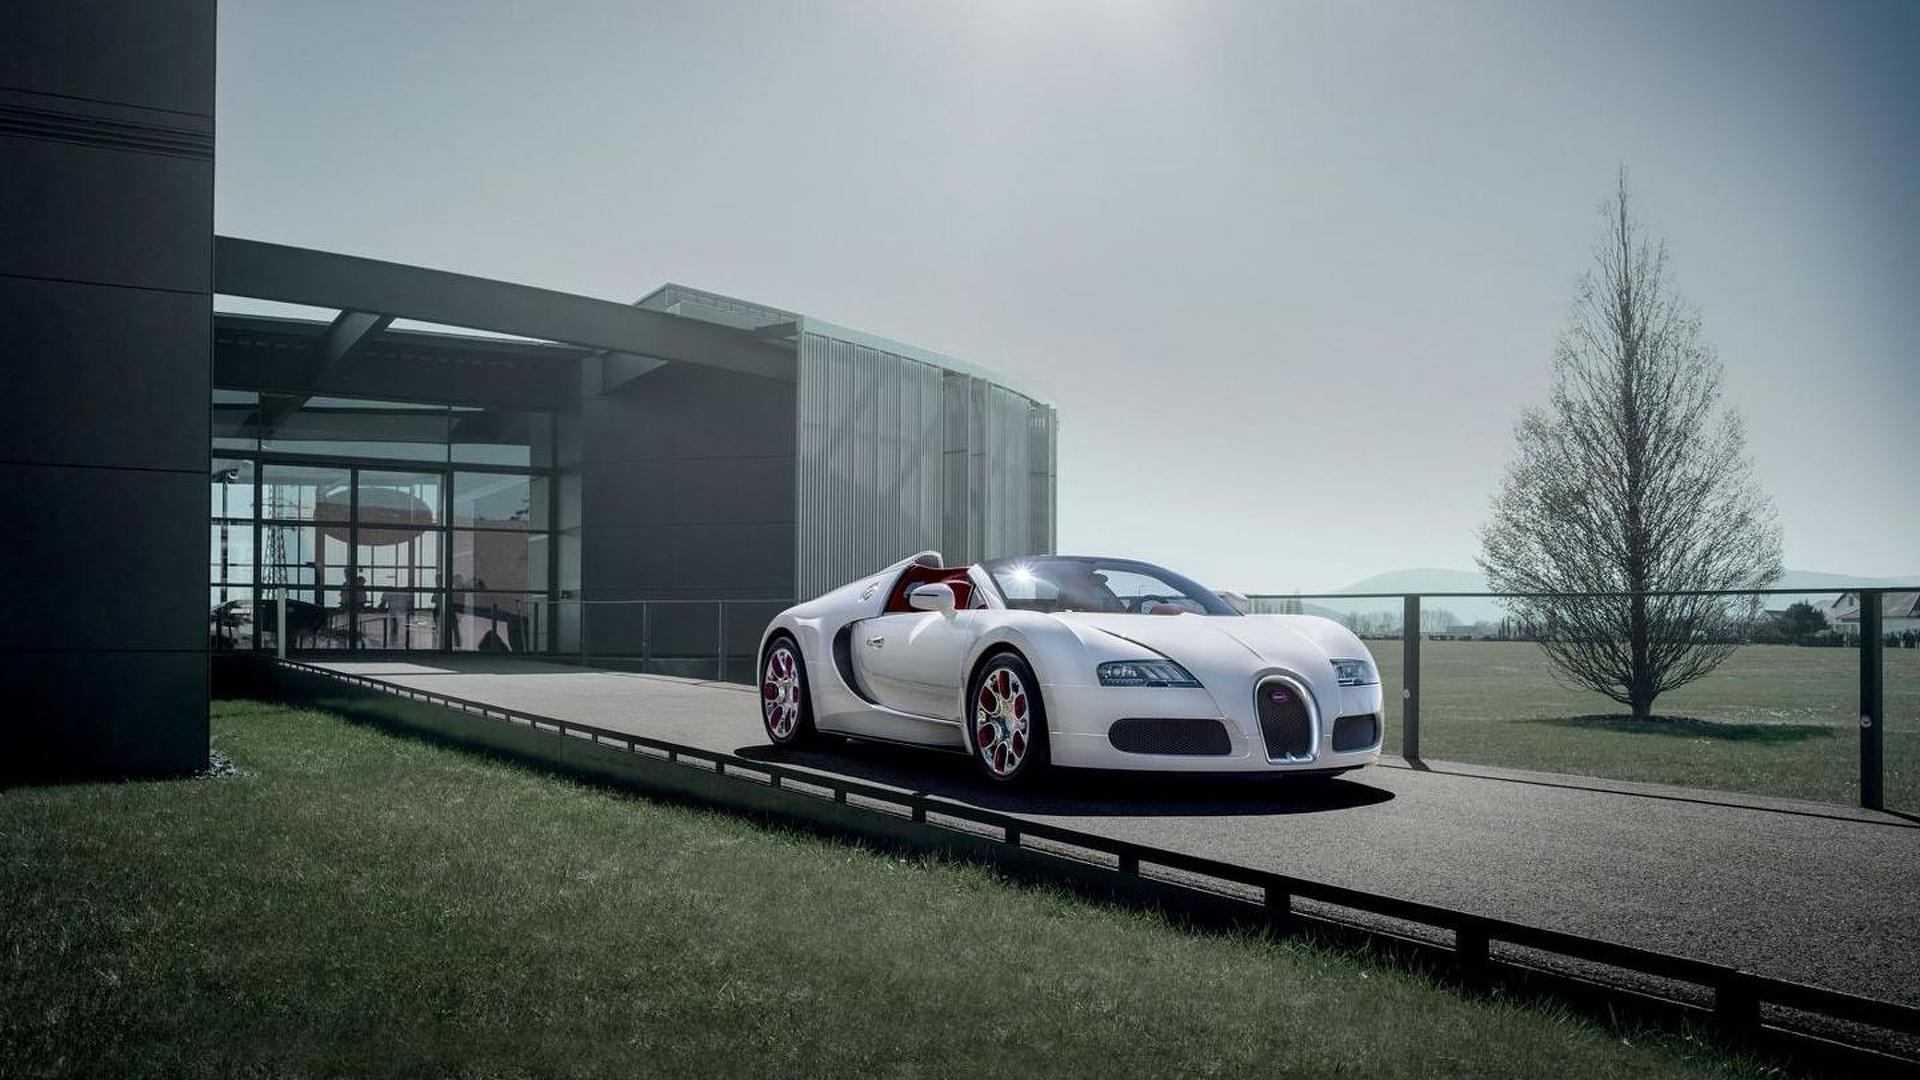 2012-310995-bugatti-veyron-grand-sport-wei-long-special-edition-23-4-20121 Amazing Bugatti Veyron Price In Australia Cars Trend